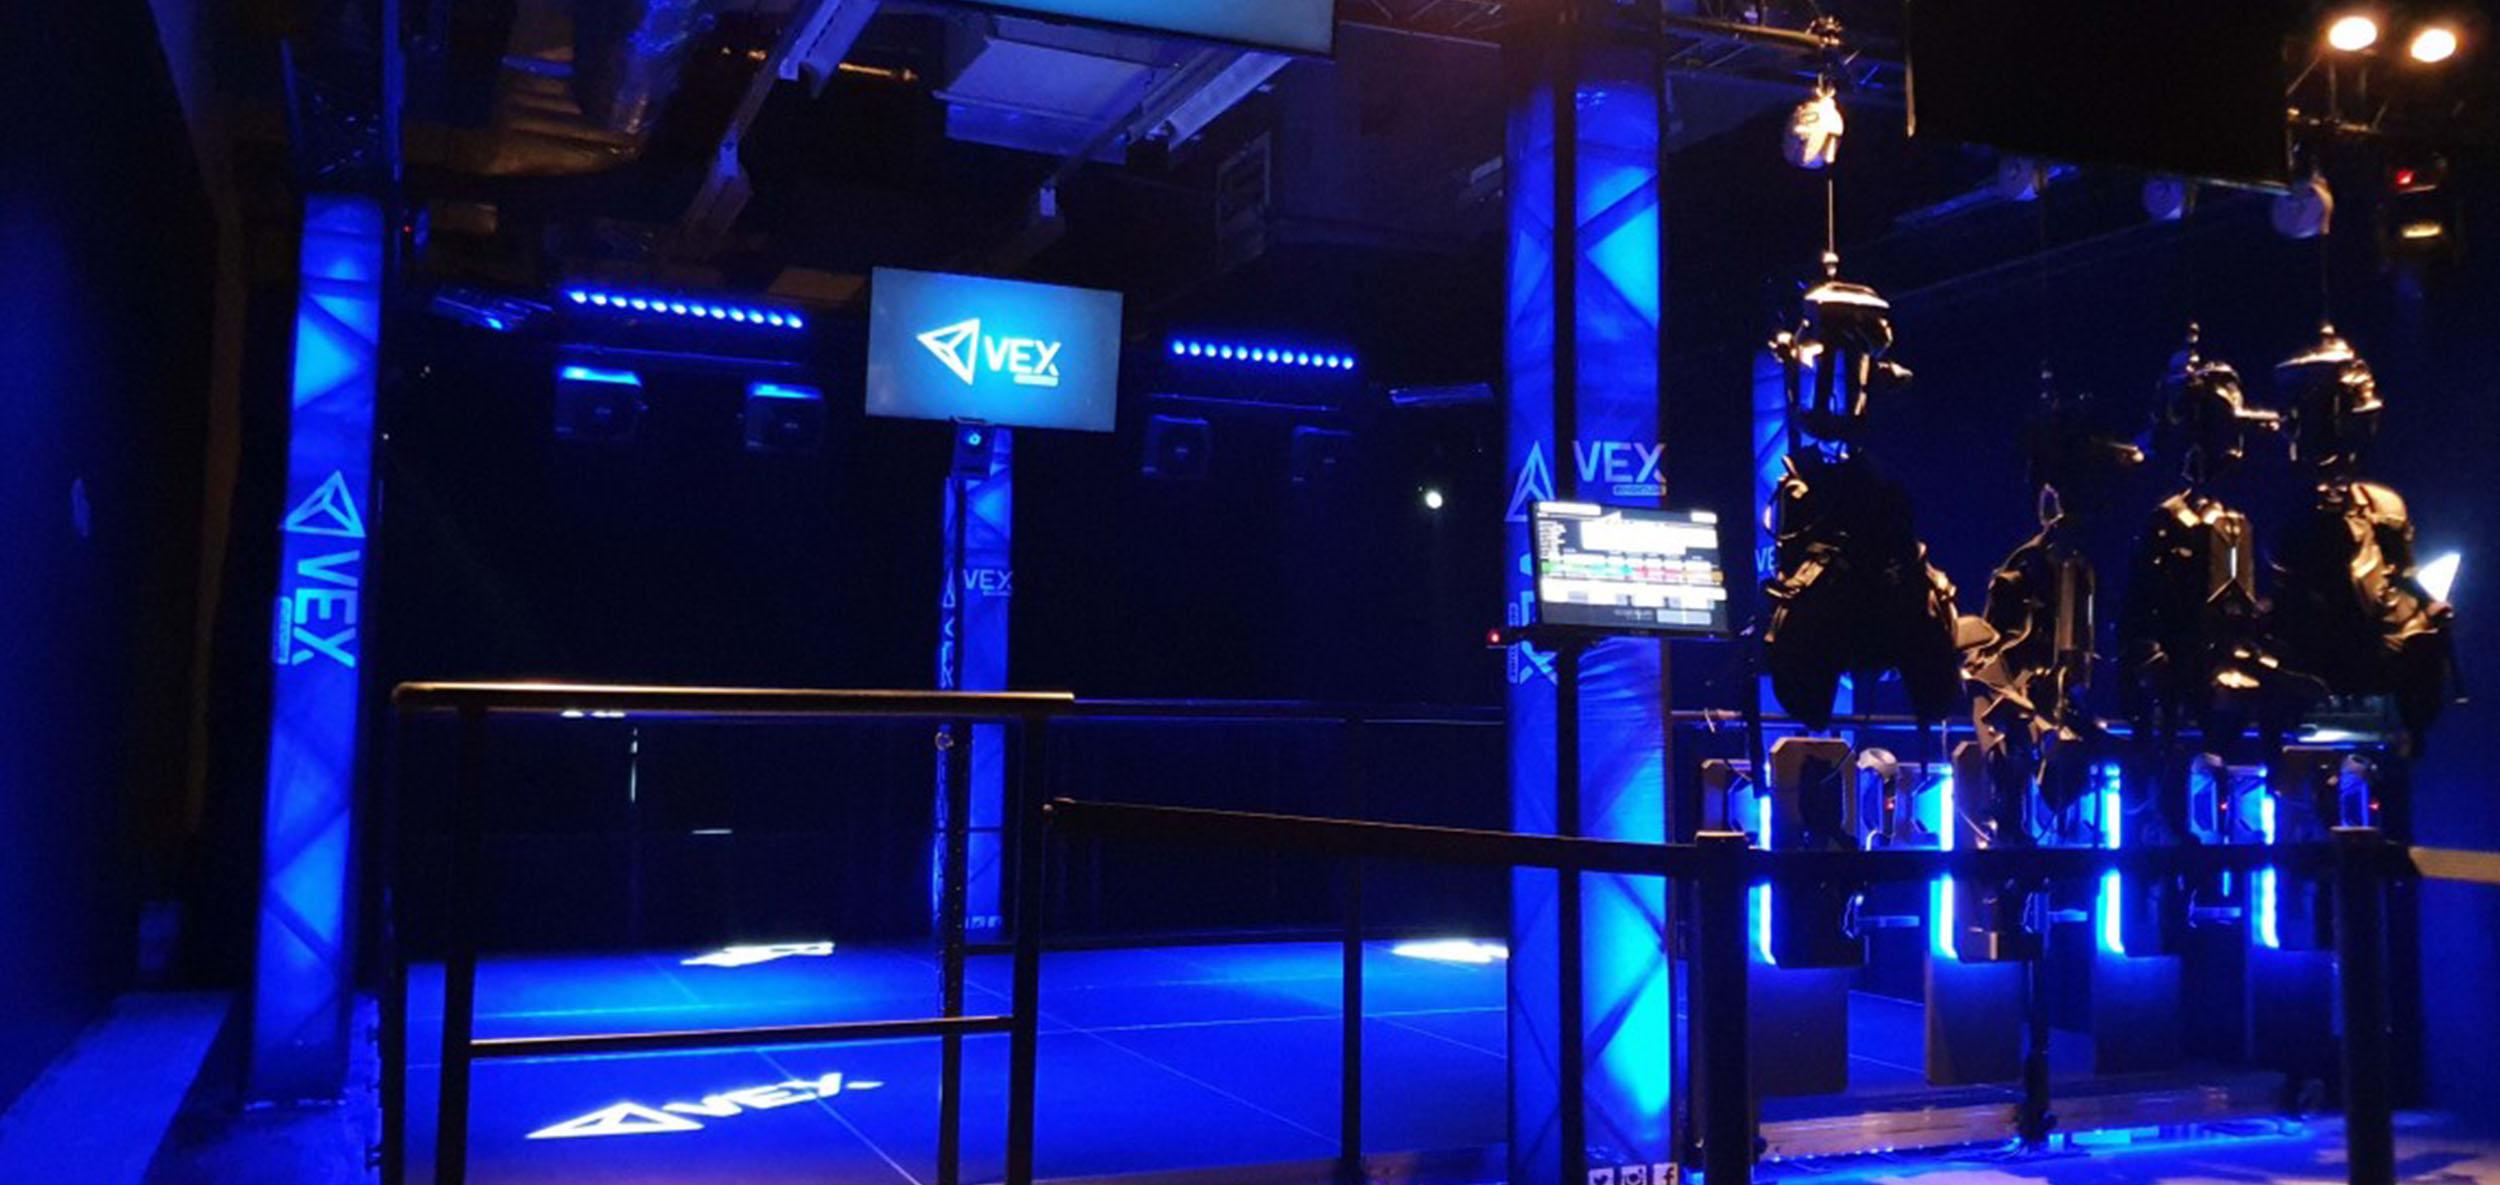 The VEX Adventure attraction